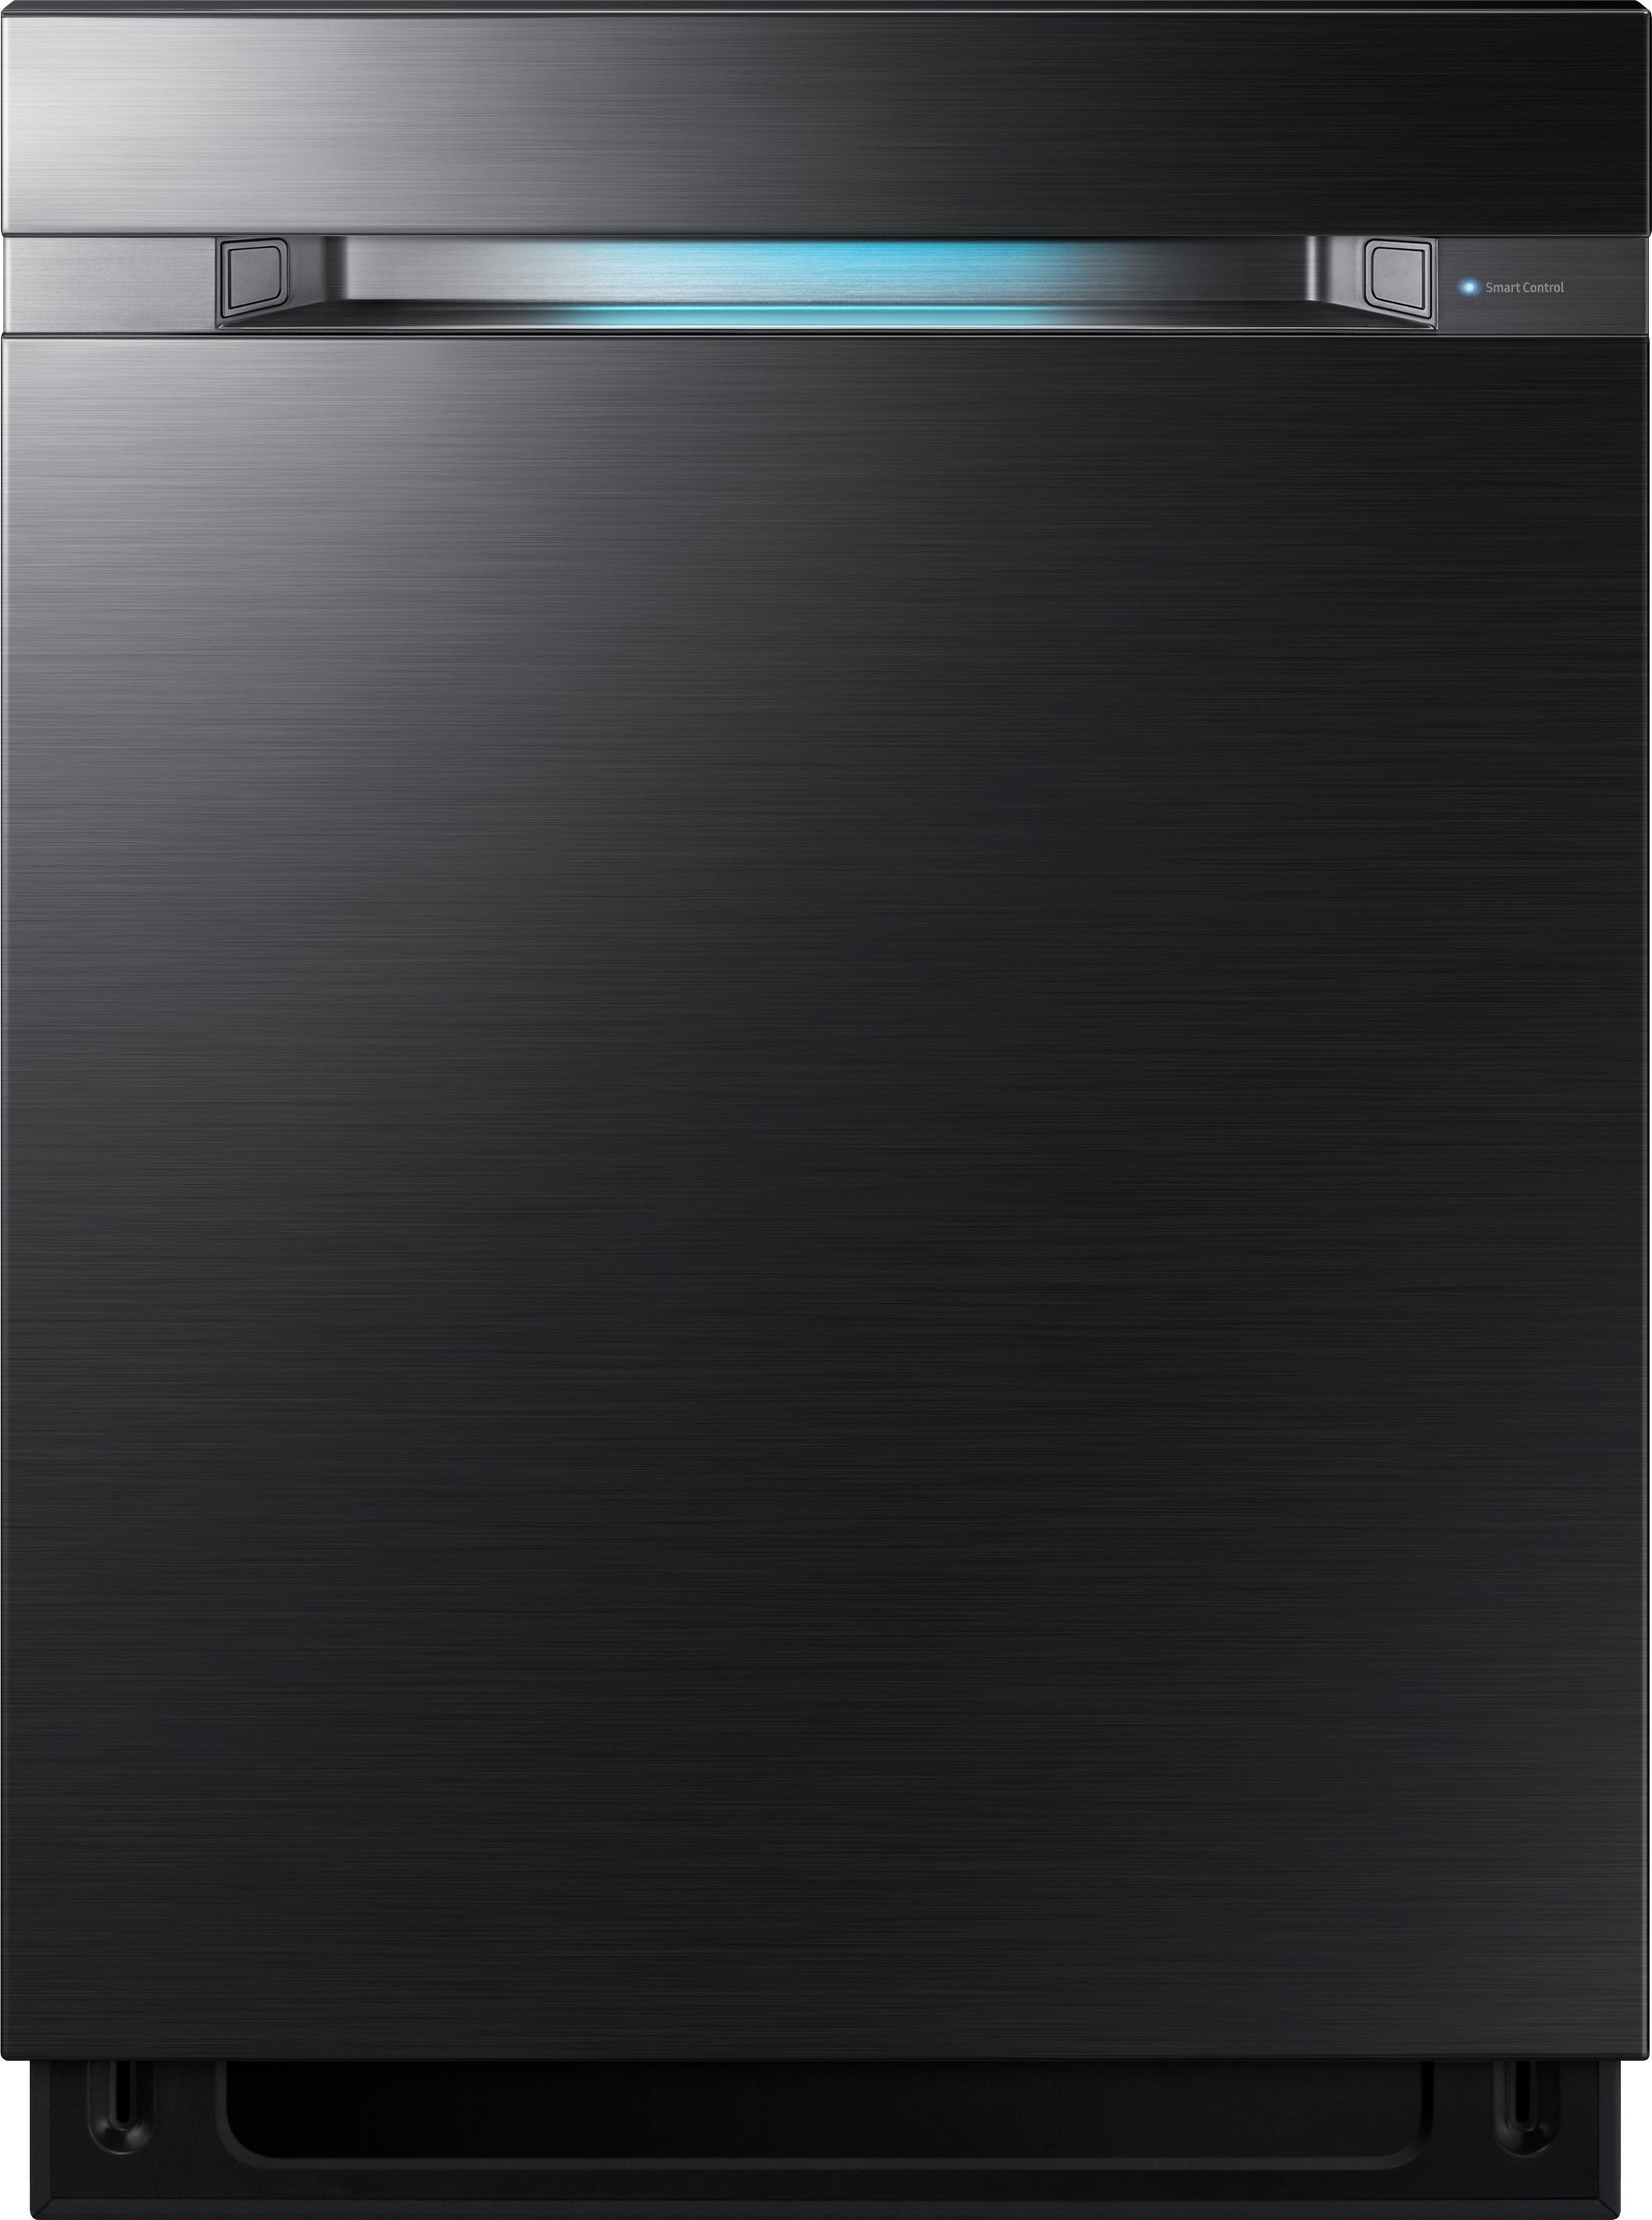 "Samsung Waterwall 24"" Tall Tub Built-In Dishwasher Black Stainless Steel DW80M9960UG"